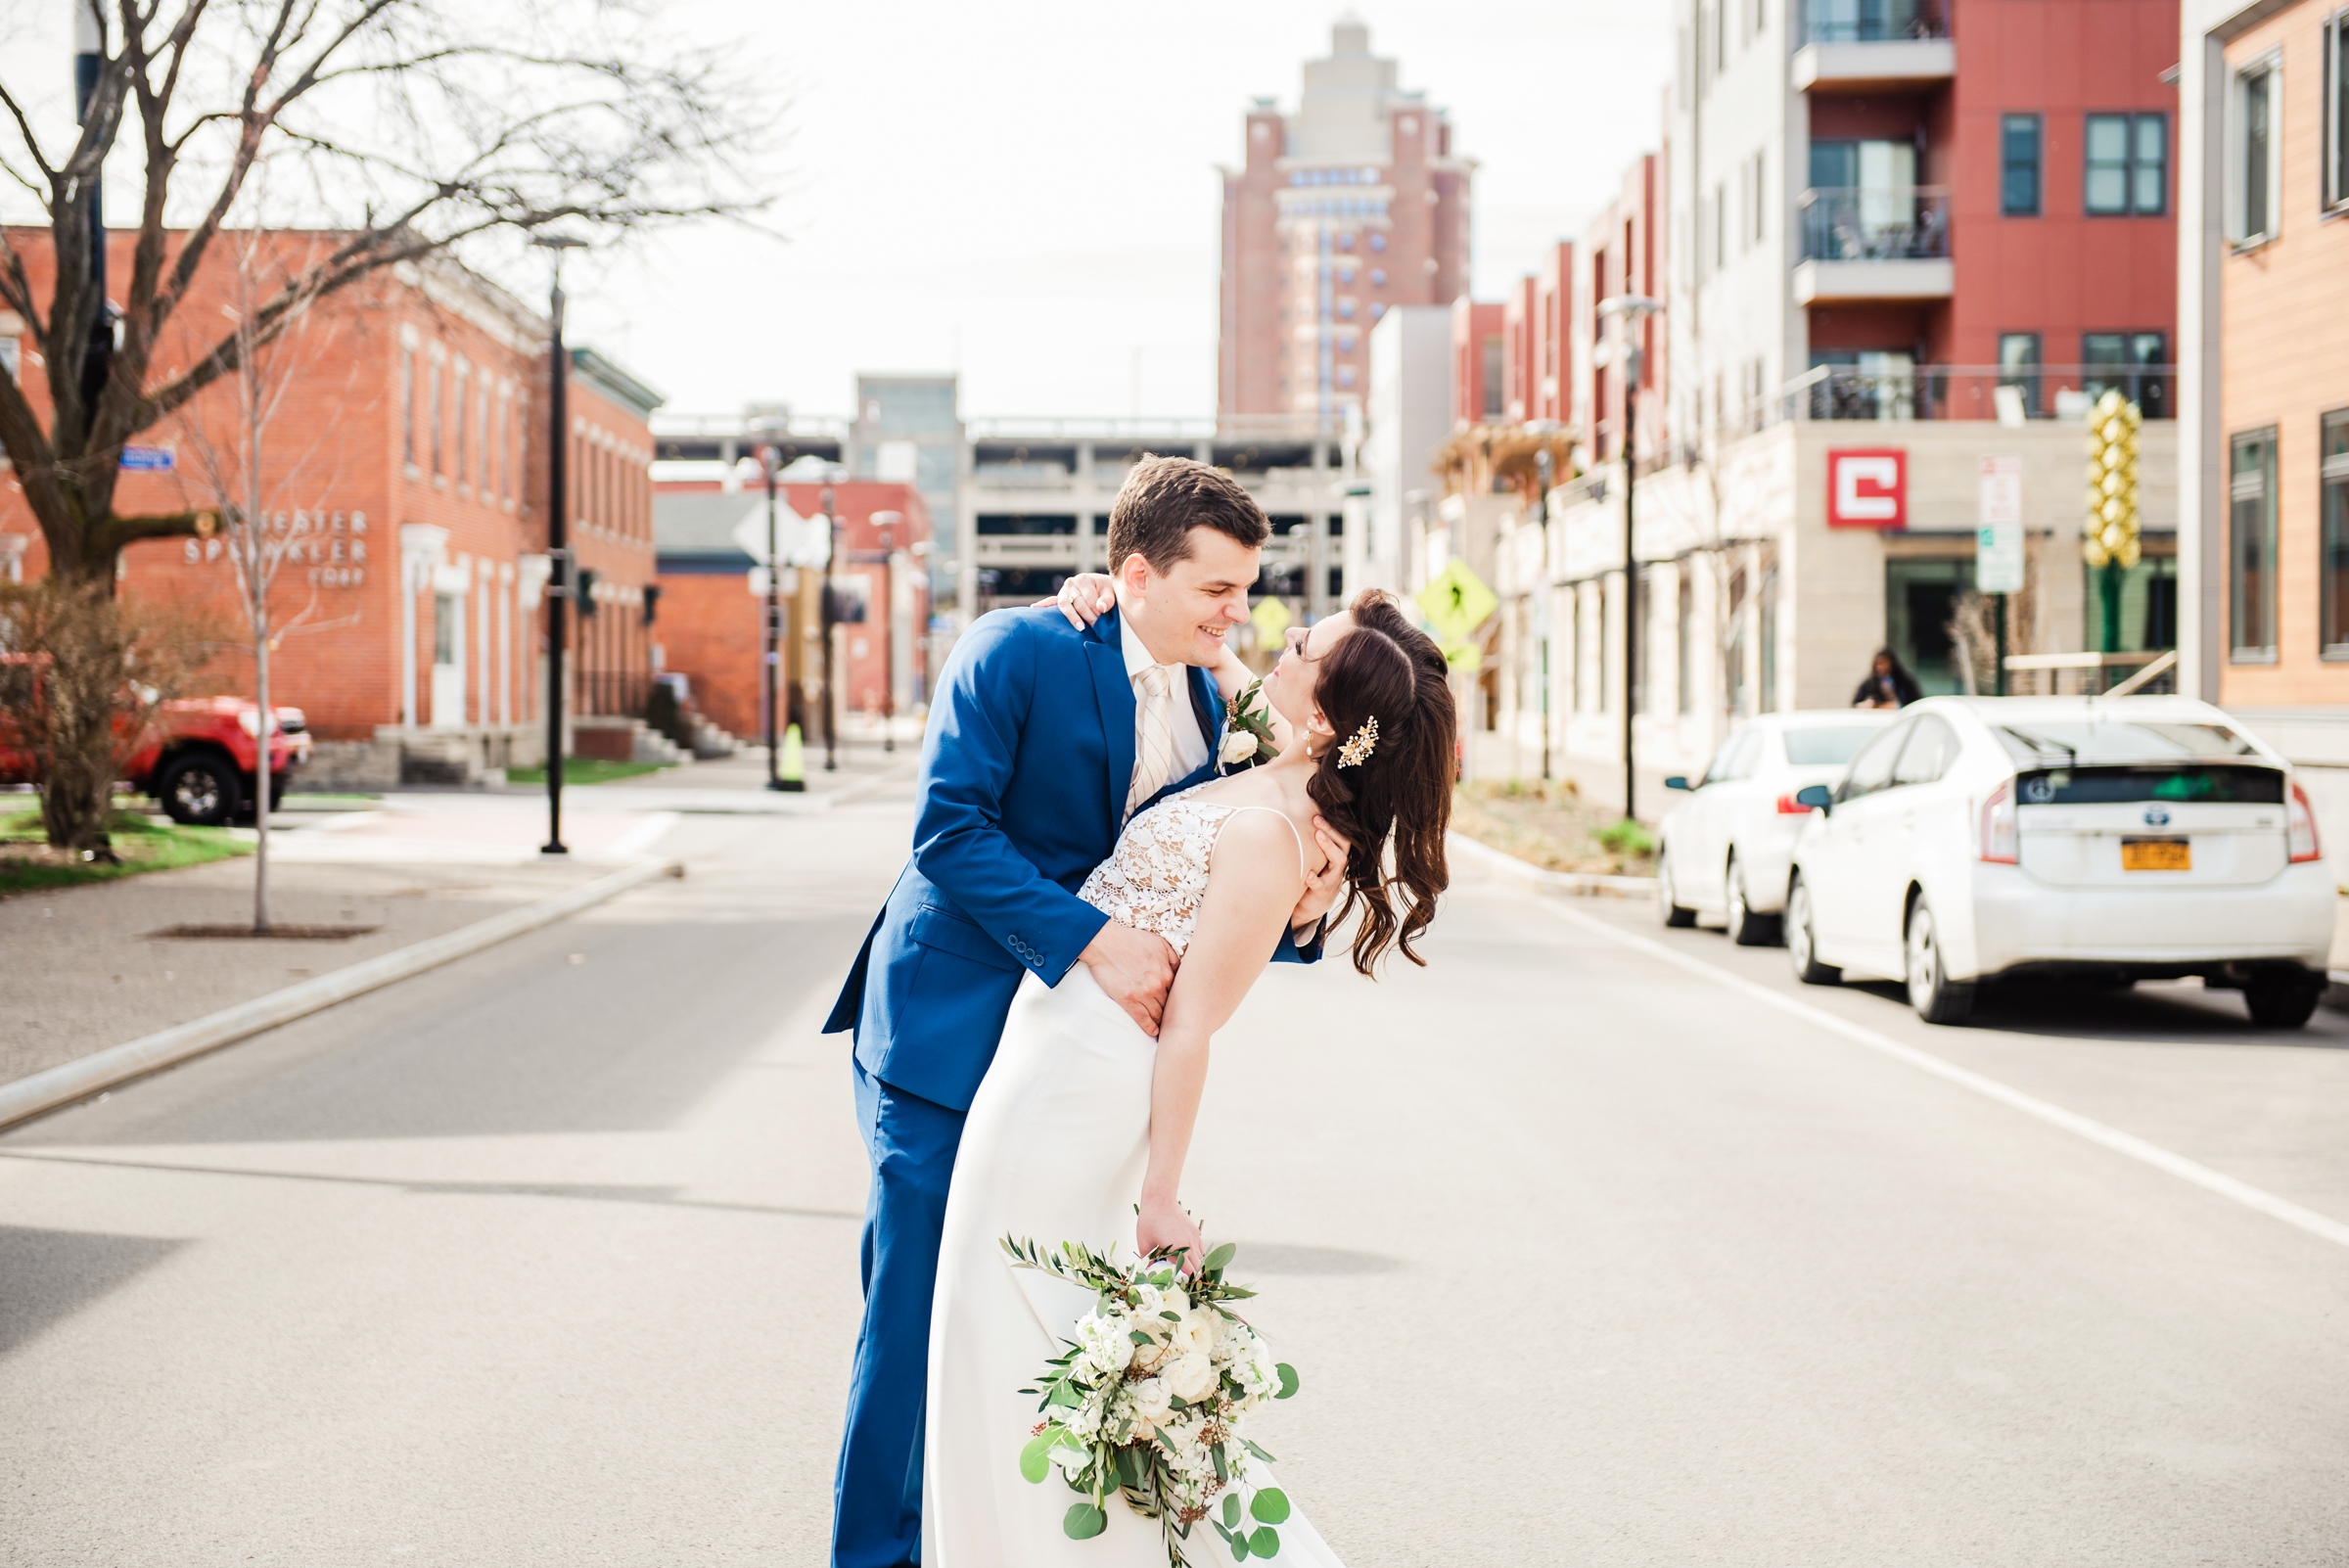 The_Arbor_LoftRochester_Wedding_JILL_STUDIO_Rochester_NY_Photographer_160058.jpg